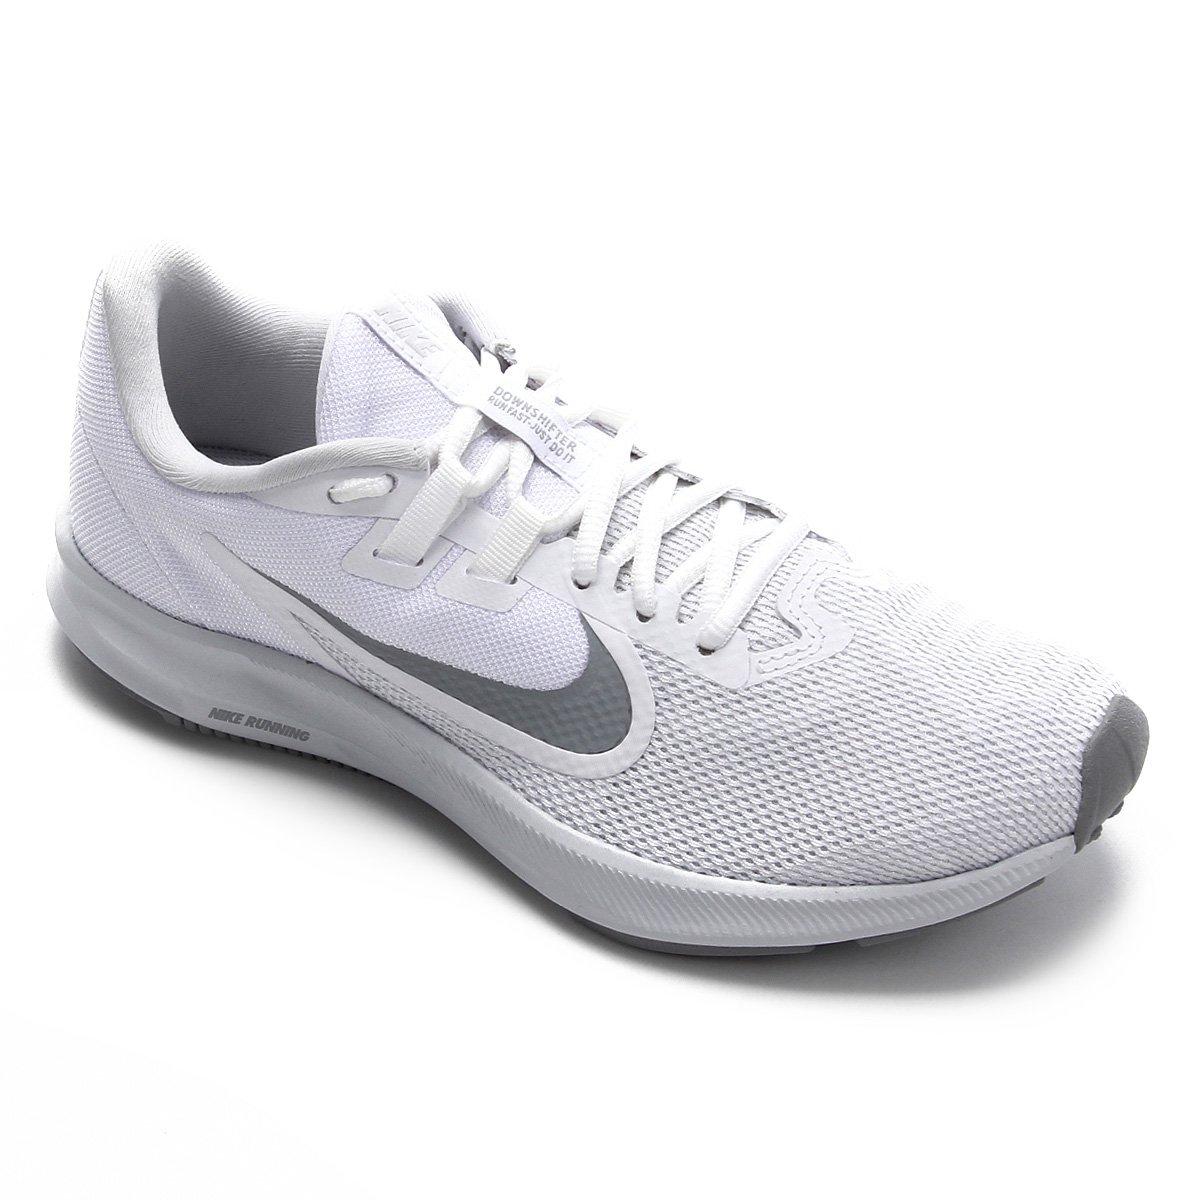 Tênis Nike Downshifter 9 Feminino Branco e Cinza